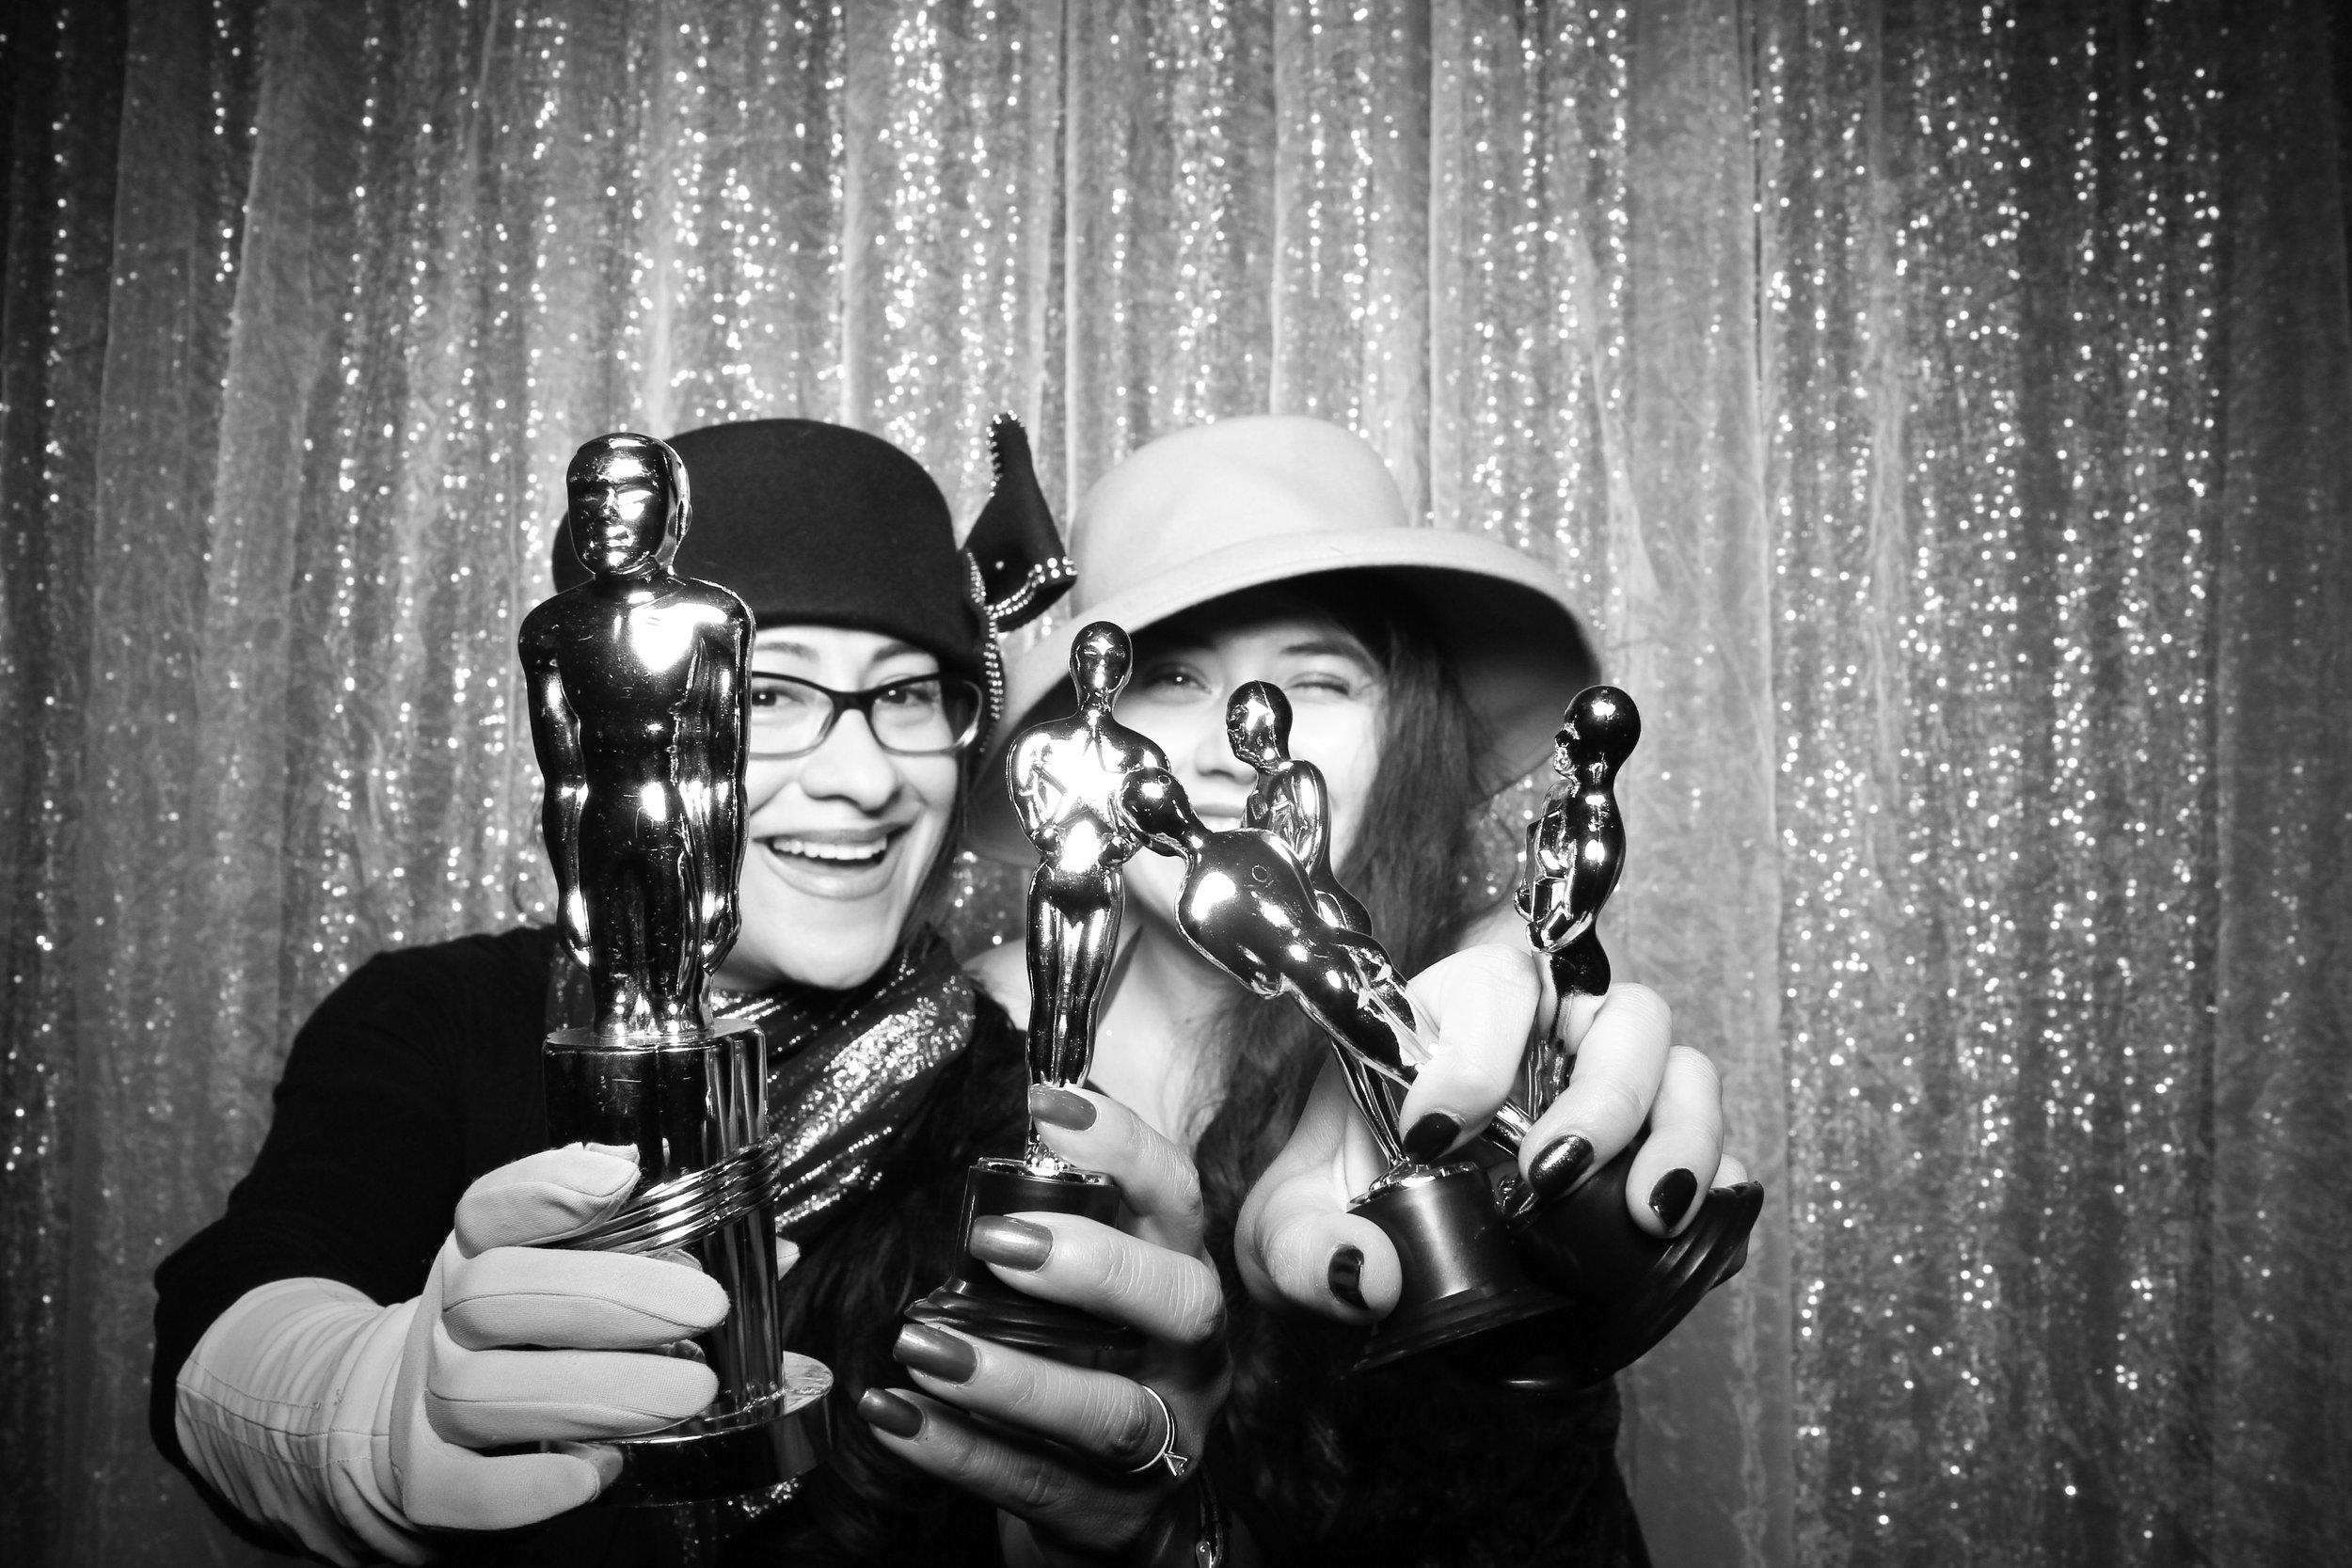 Chicago_Vintage_Wedding_Photobooth_W_Lakeshore_Hotel_27.jpg